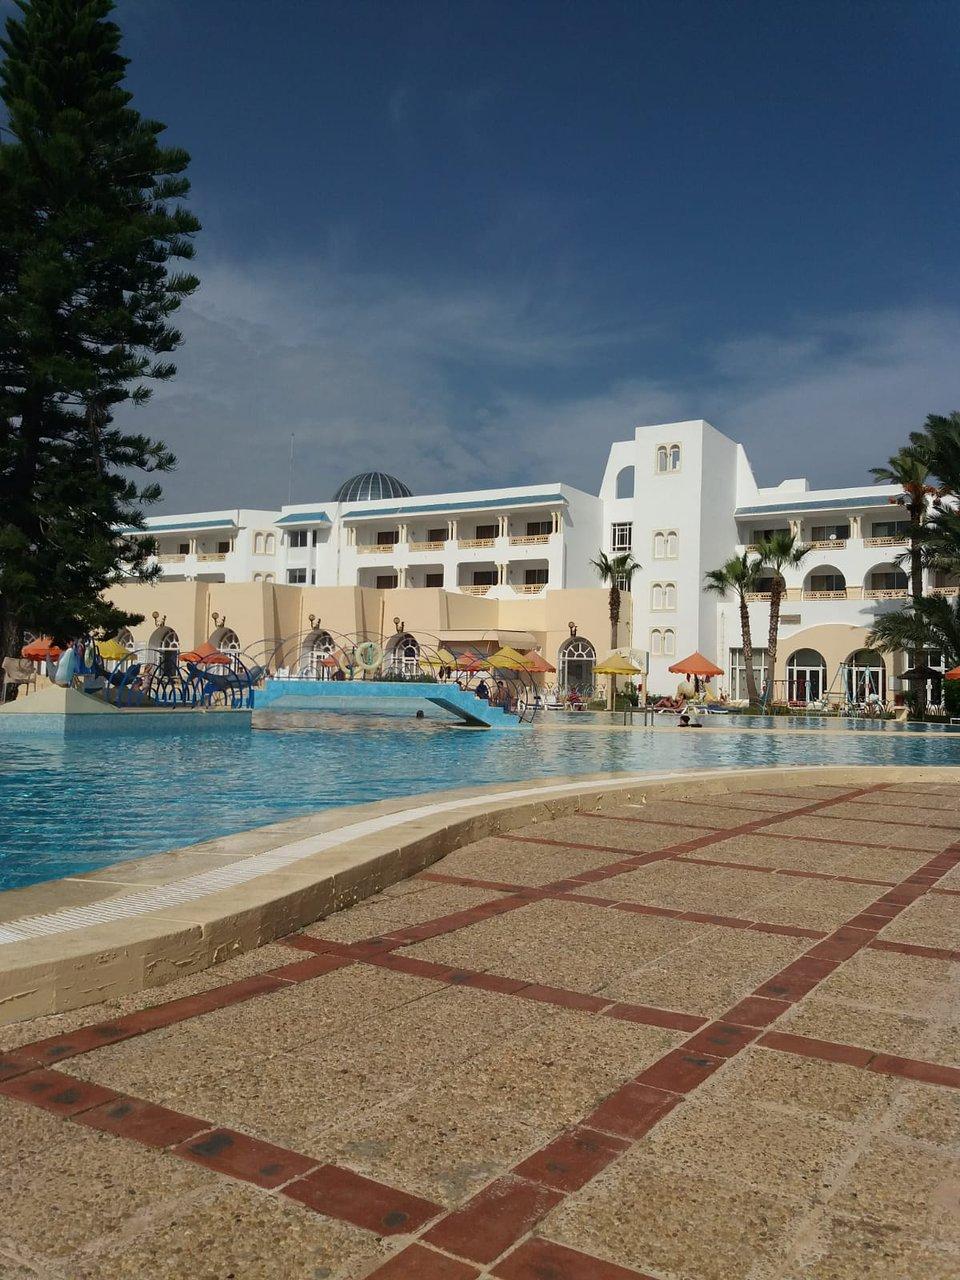 Hotel Club Tropicana, Tunisia: reviews. Holidays in Tunisia